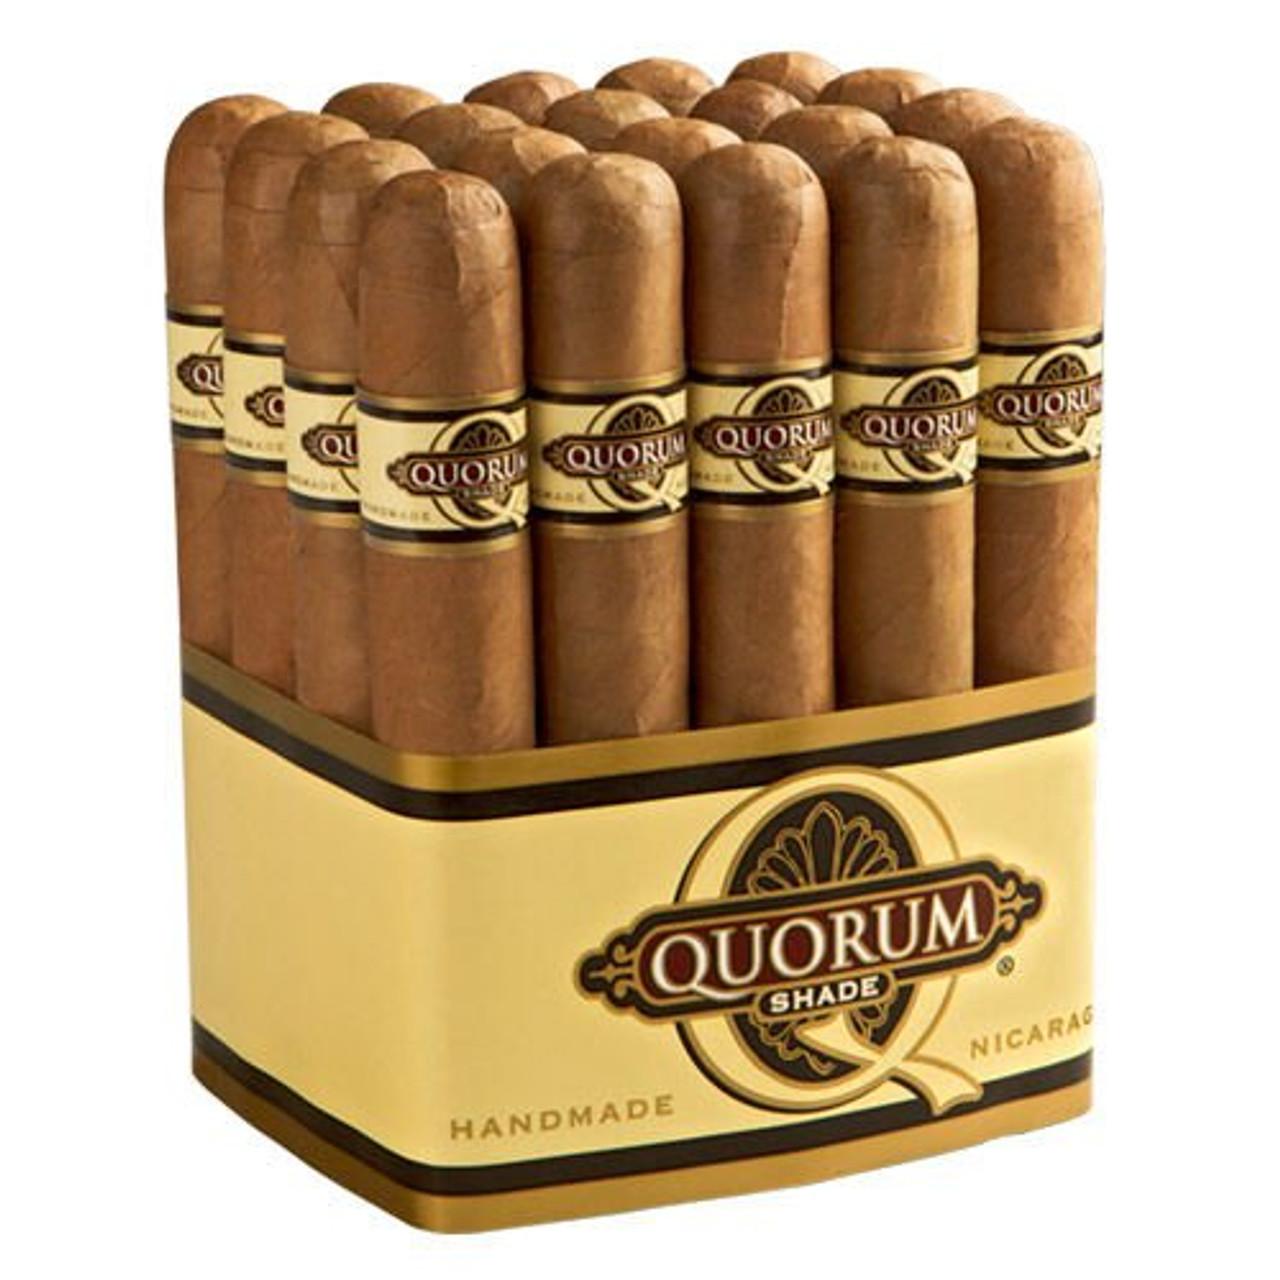 Quorum Shade Torpedo Cigars - 6.0 x 50 (Bundle of 20)